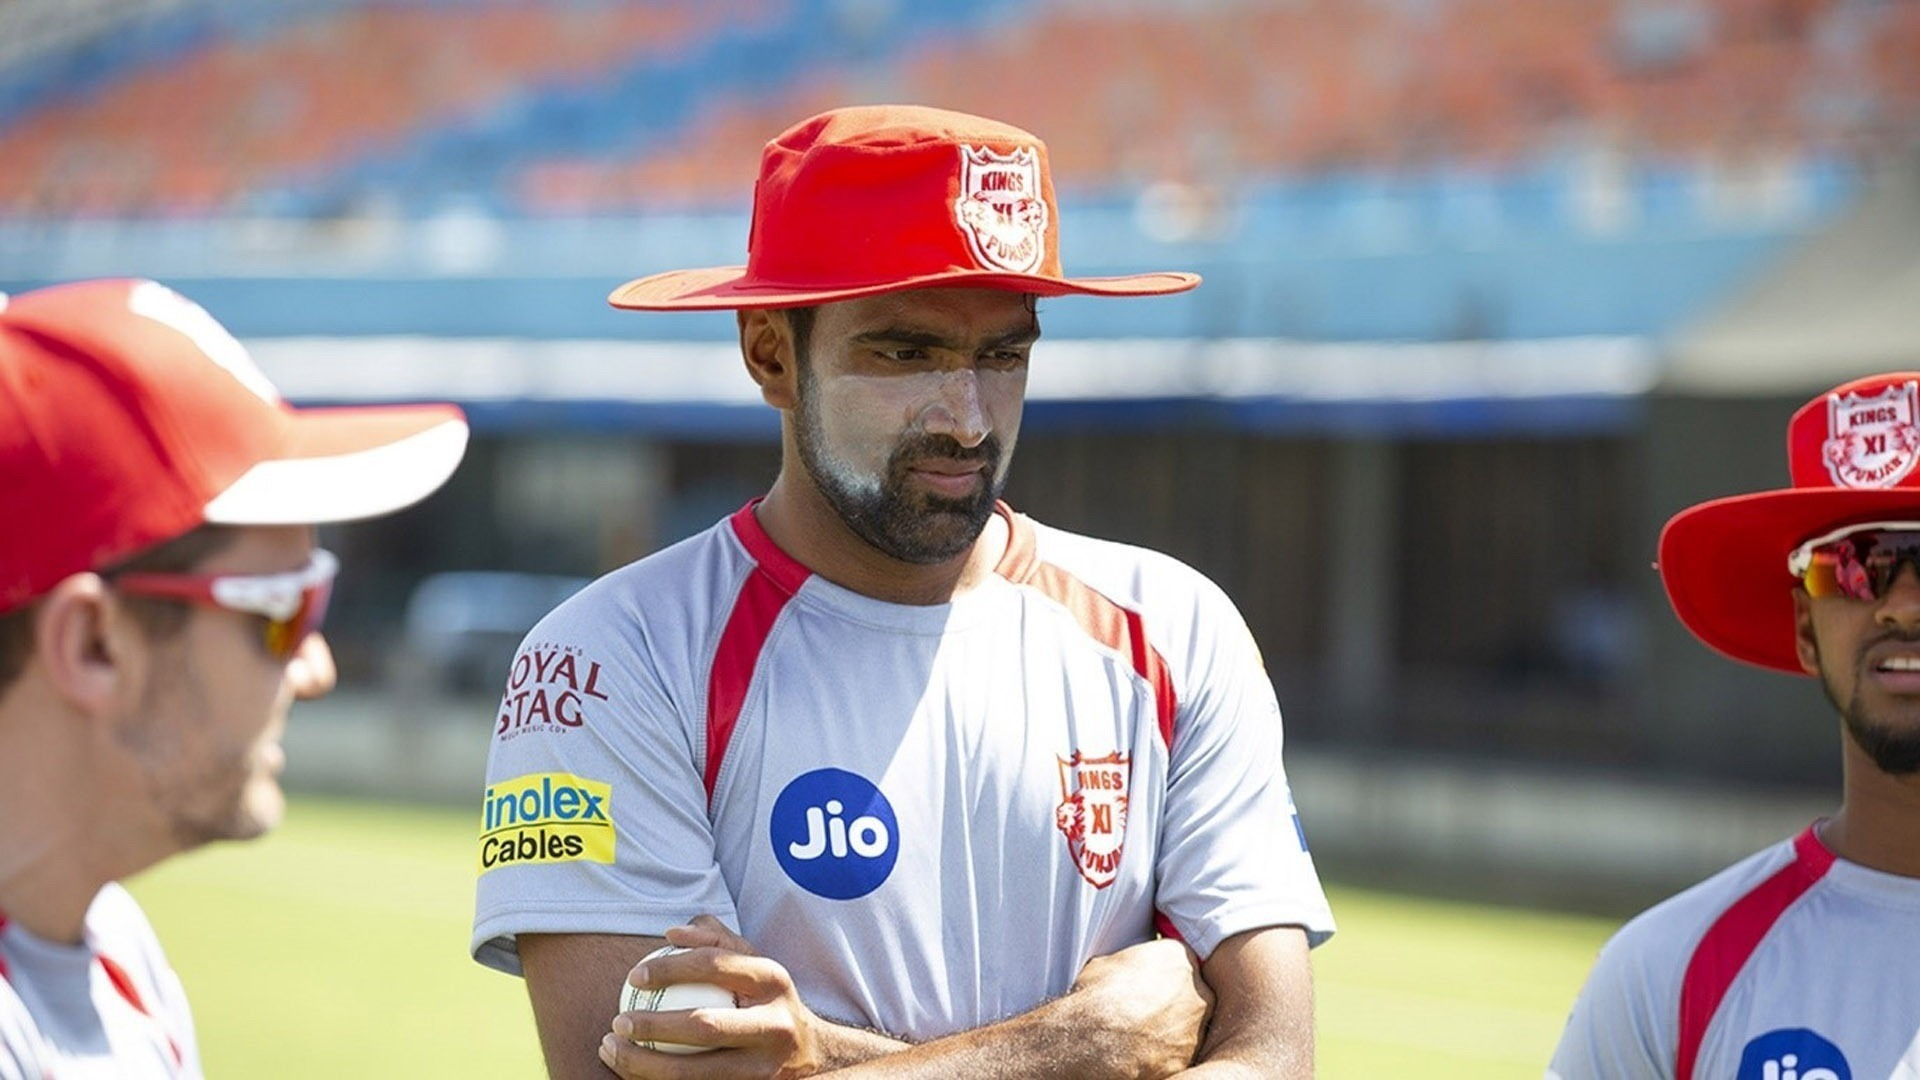 Ravichandran Ashwin and Kings XI Punjab have parted ways ahead of the 2020 IPL